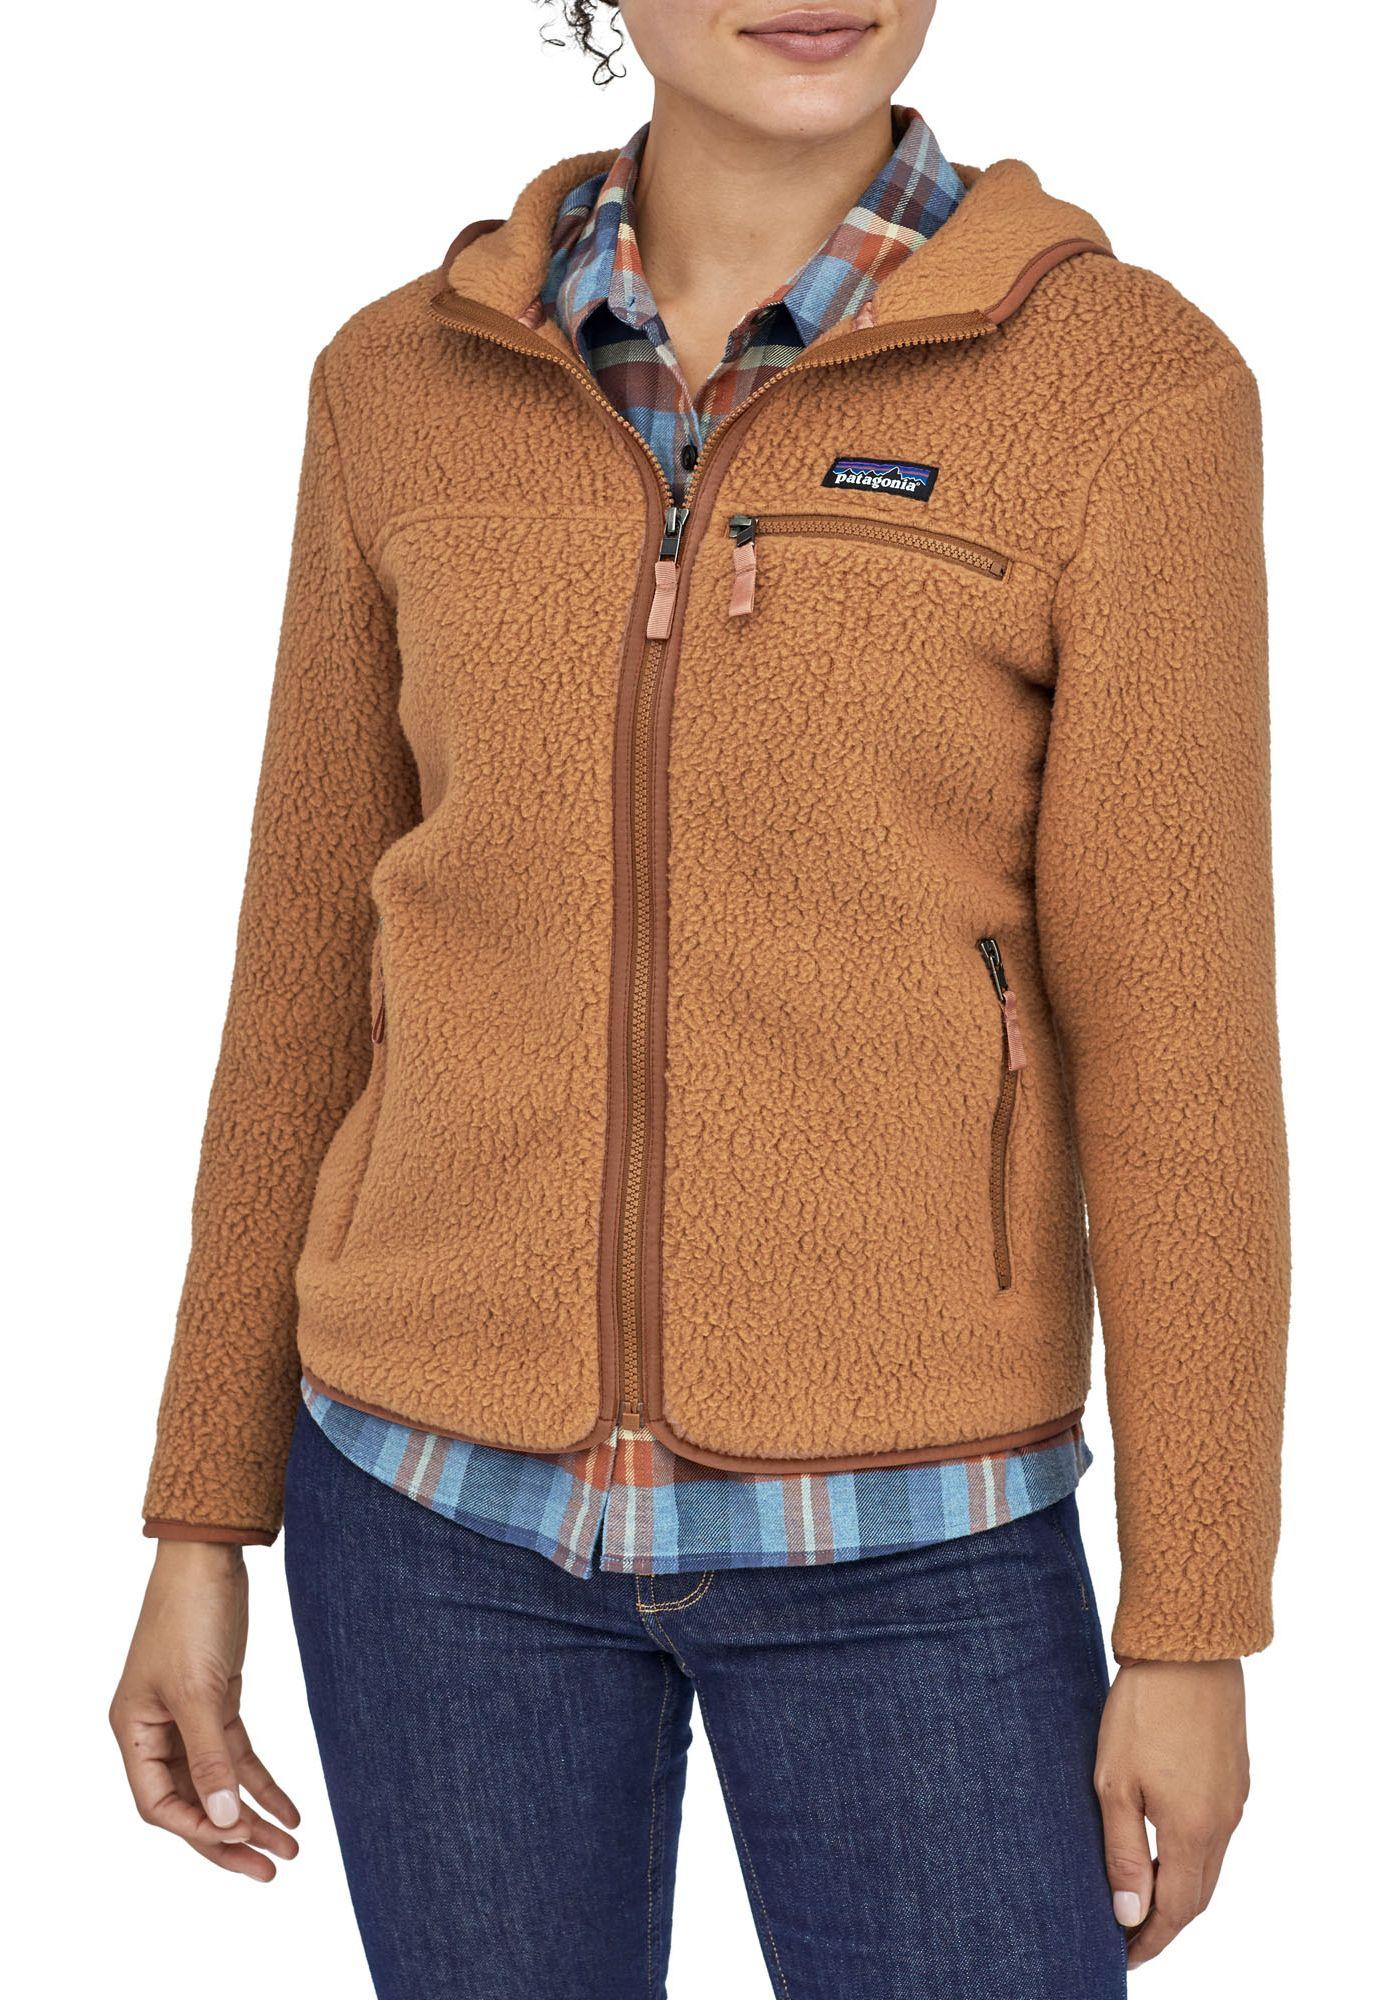 Patagonia Women's Retro Pile Fleece Hoodie